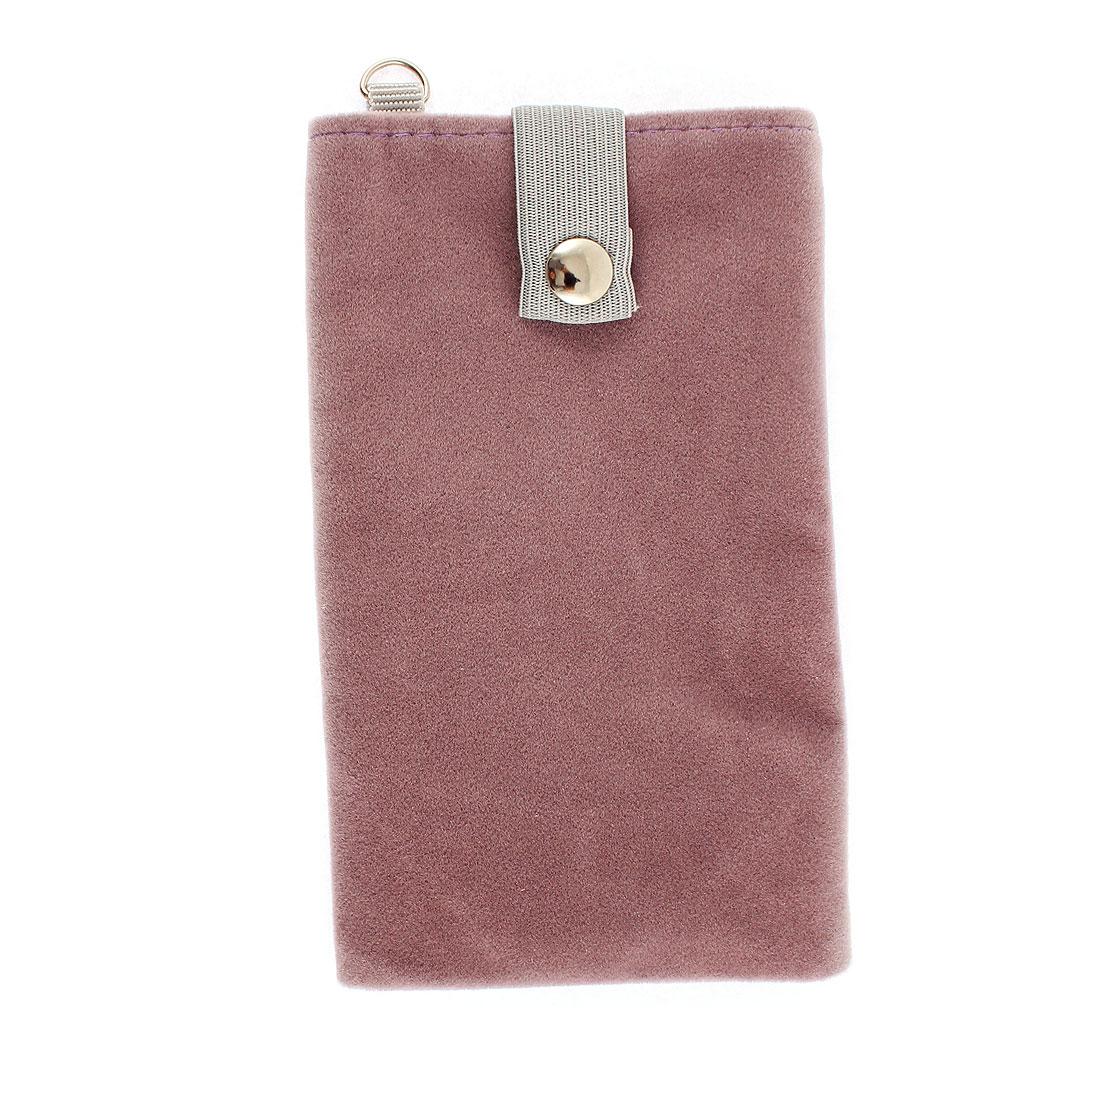 Velvet Magnetic Clasp Button Cell Phone Pouch Sleeve Bag Light Purple 16x9.5cm